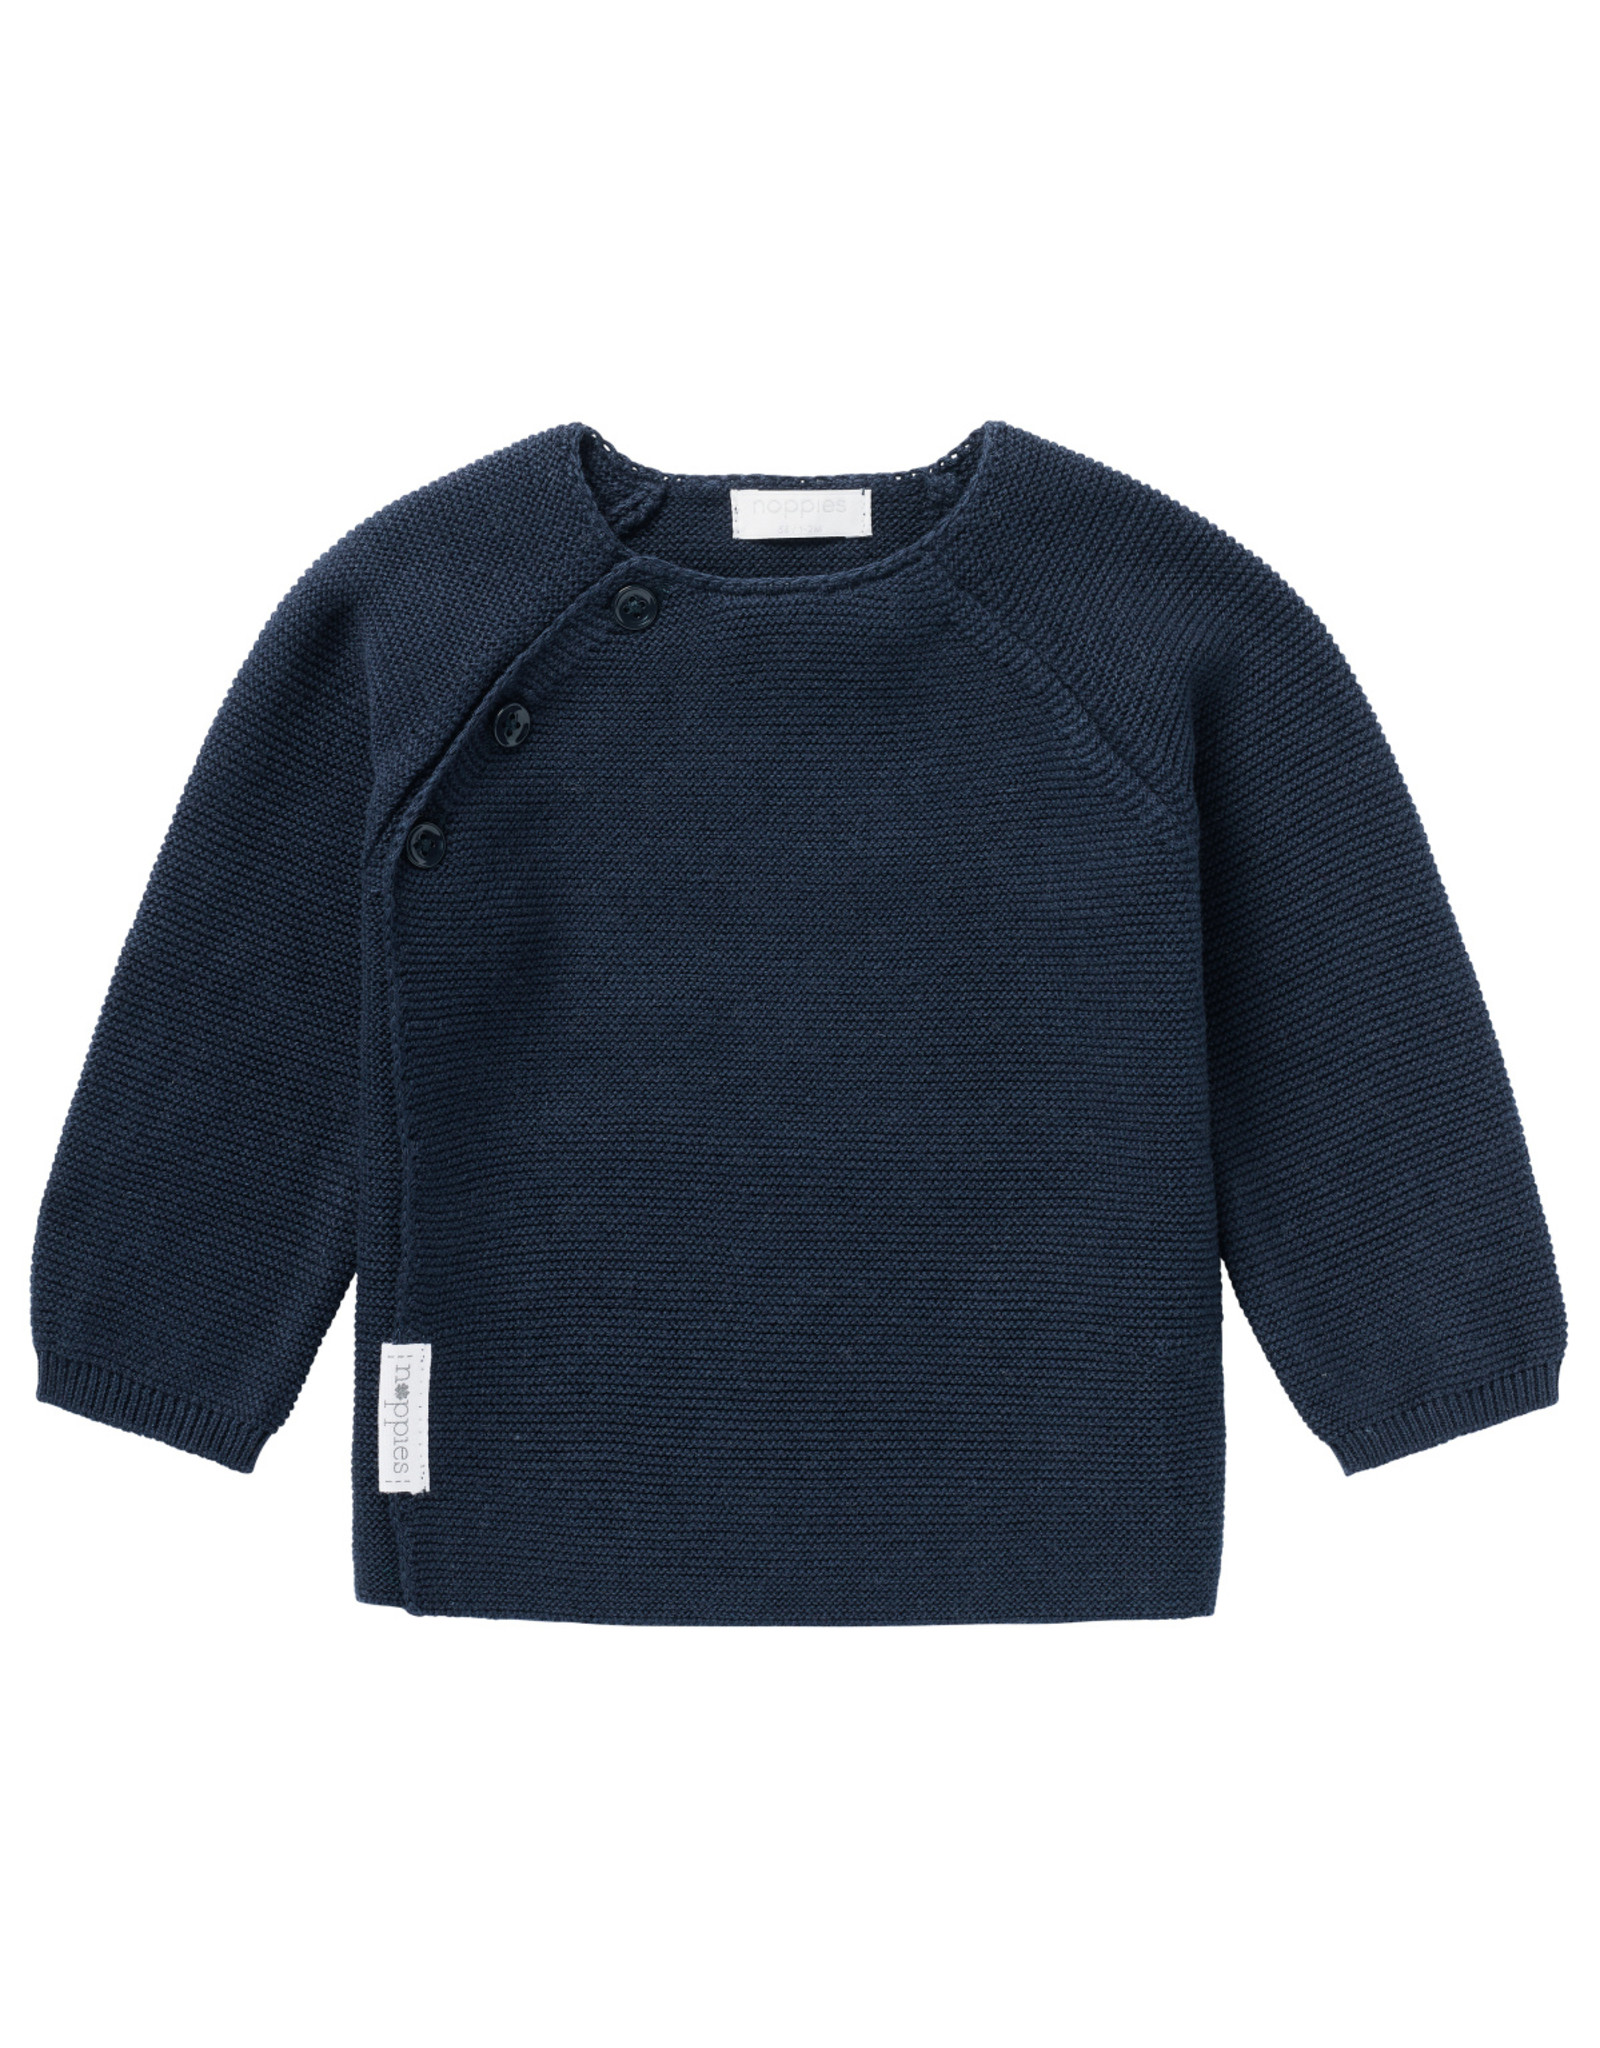 Noppies U Cardigan Knit ls Pino Navy